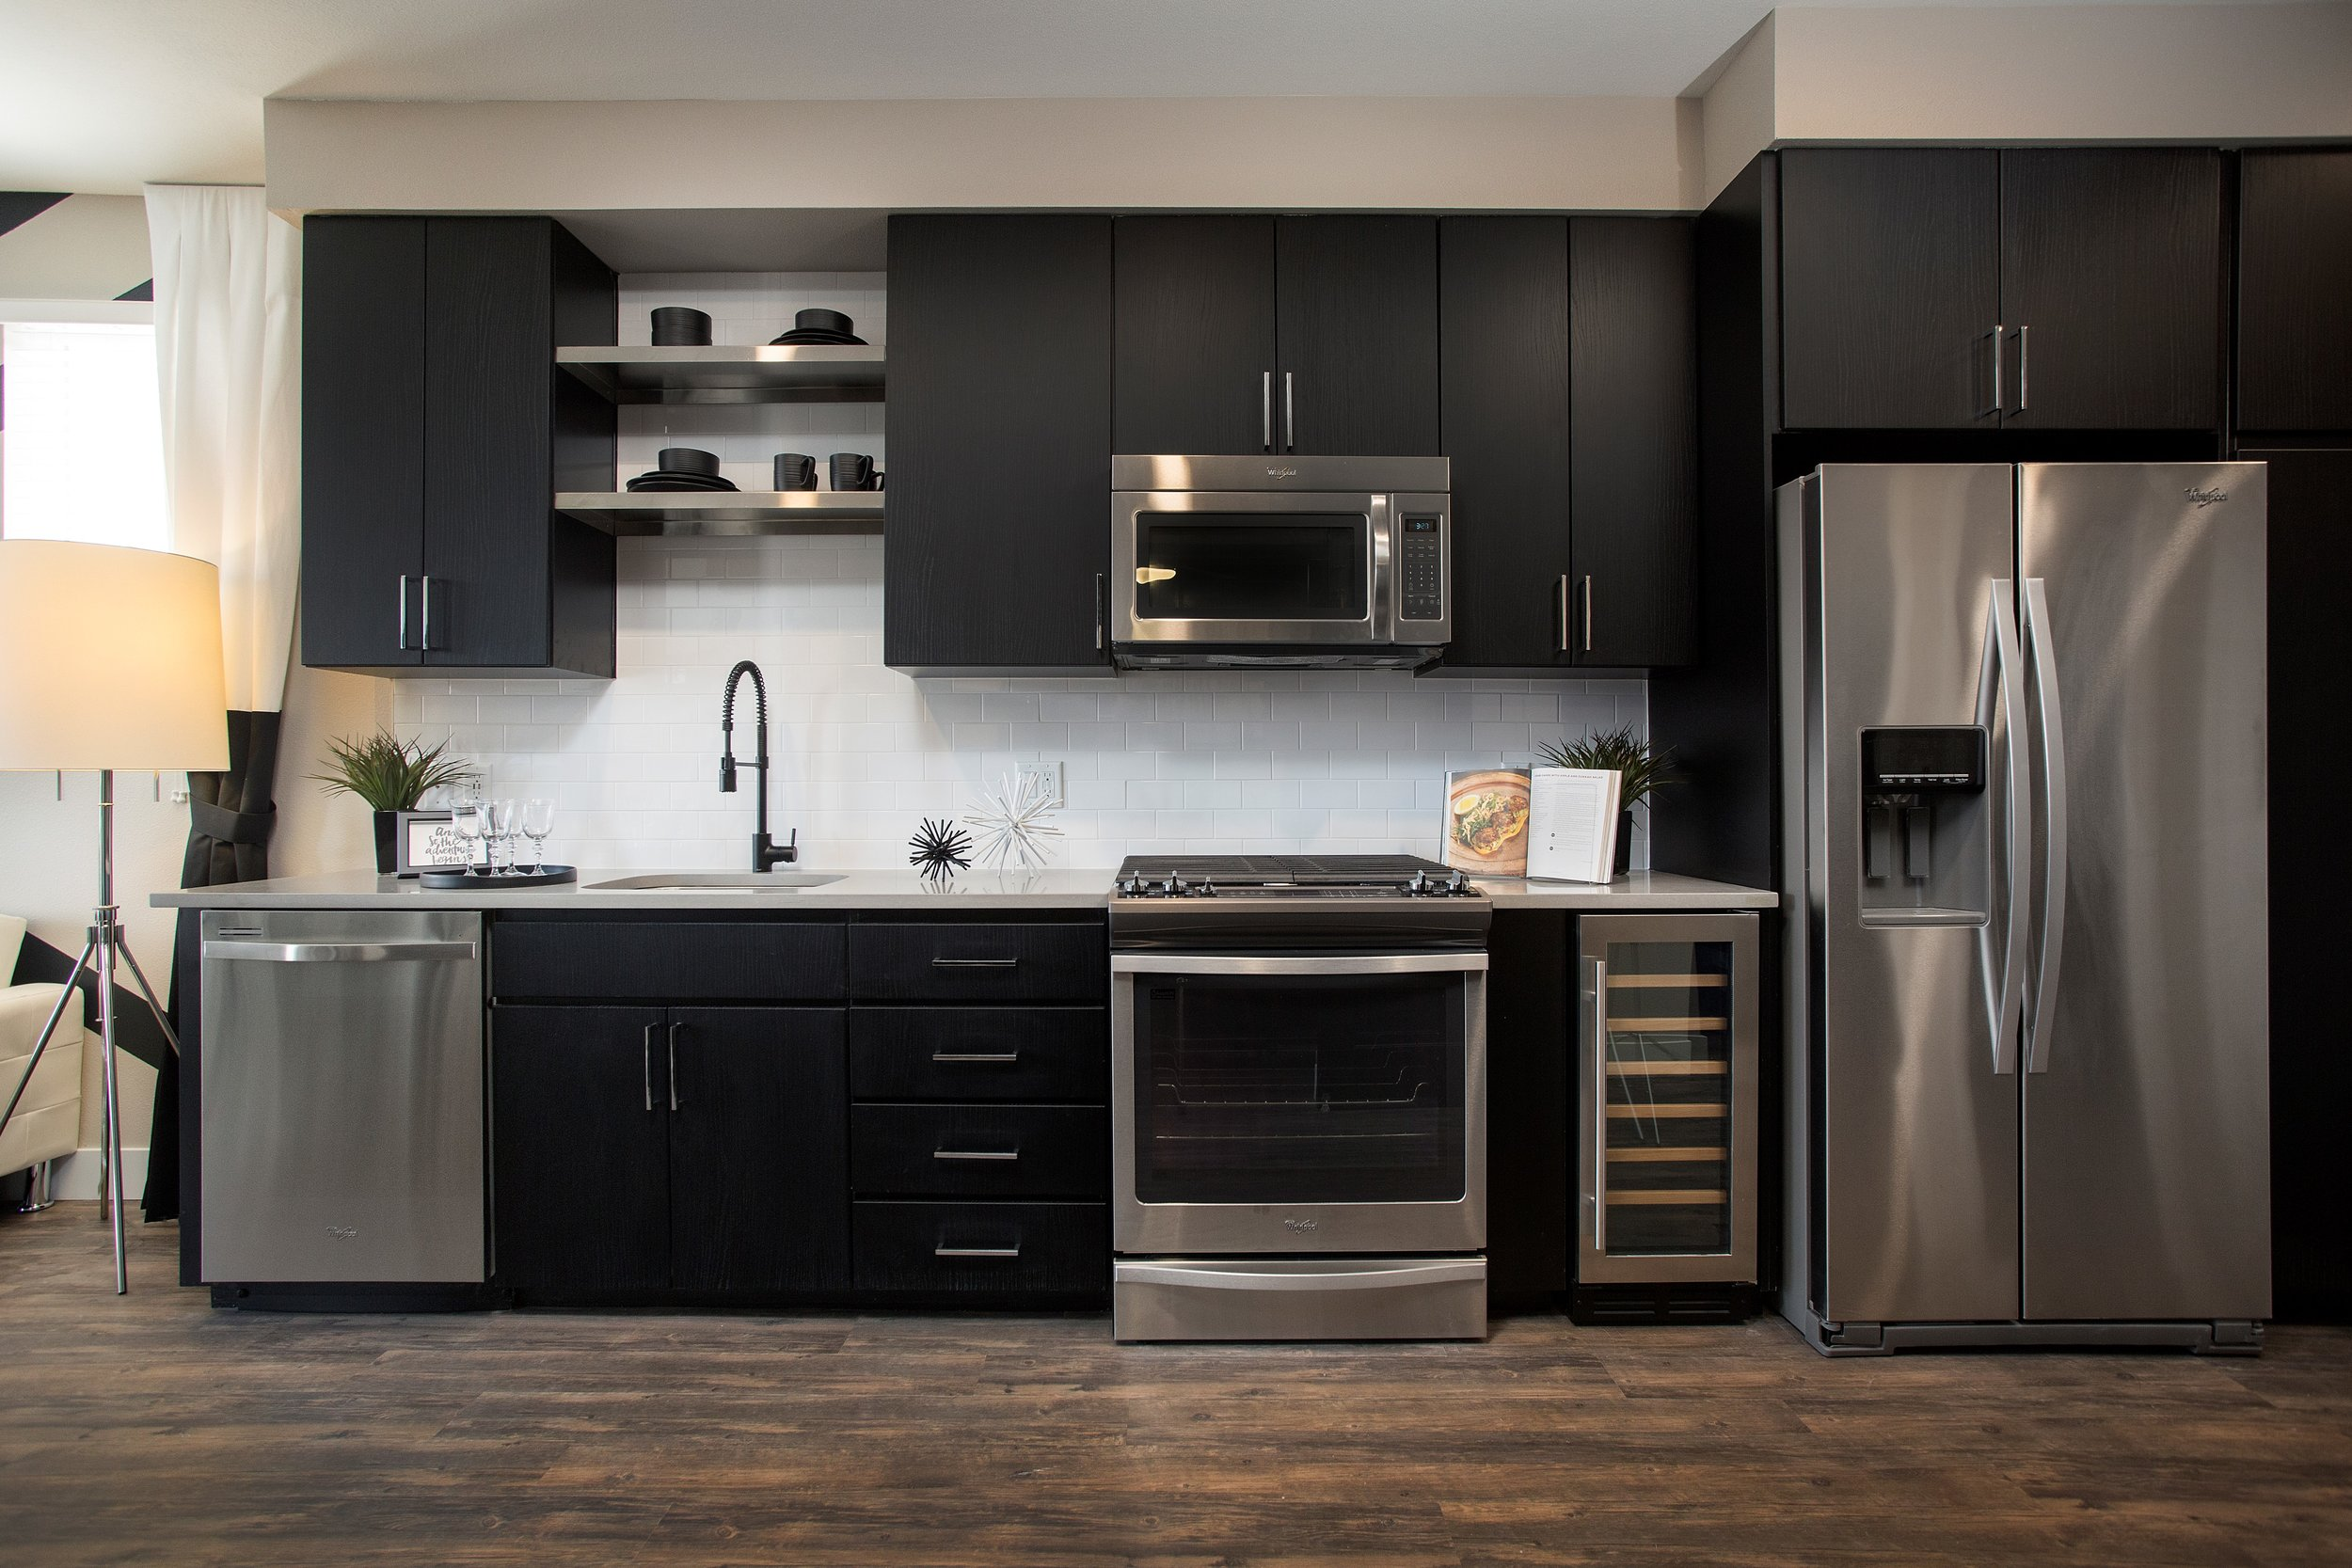 04-Modern Kitchens with Quartz Countertops _ Stainless Steel Appliances.jpg